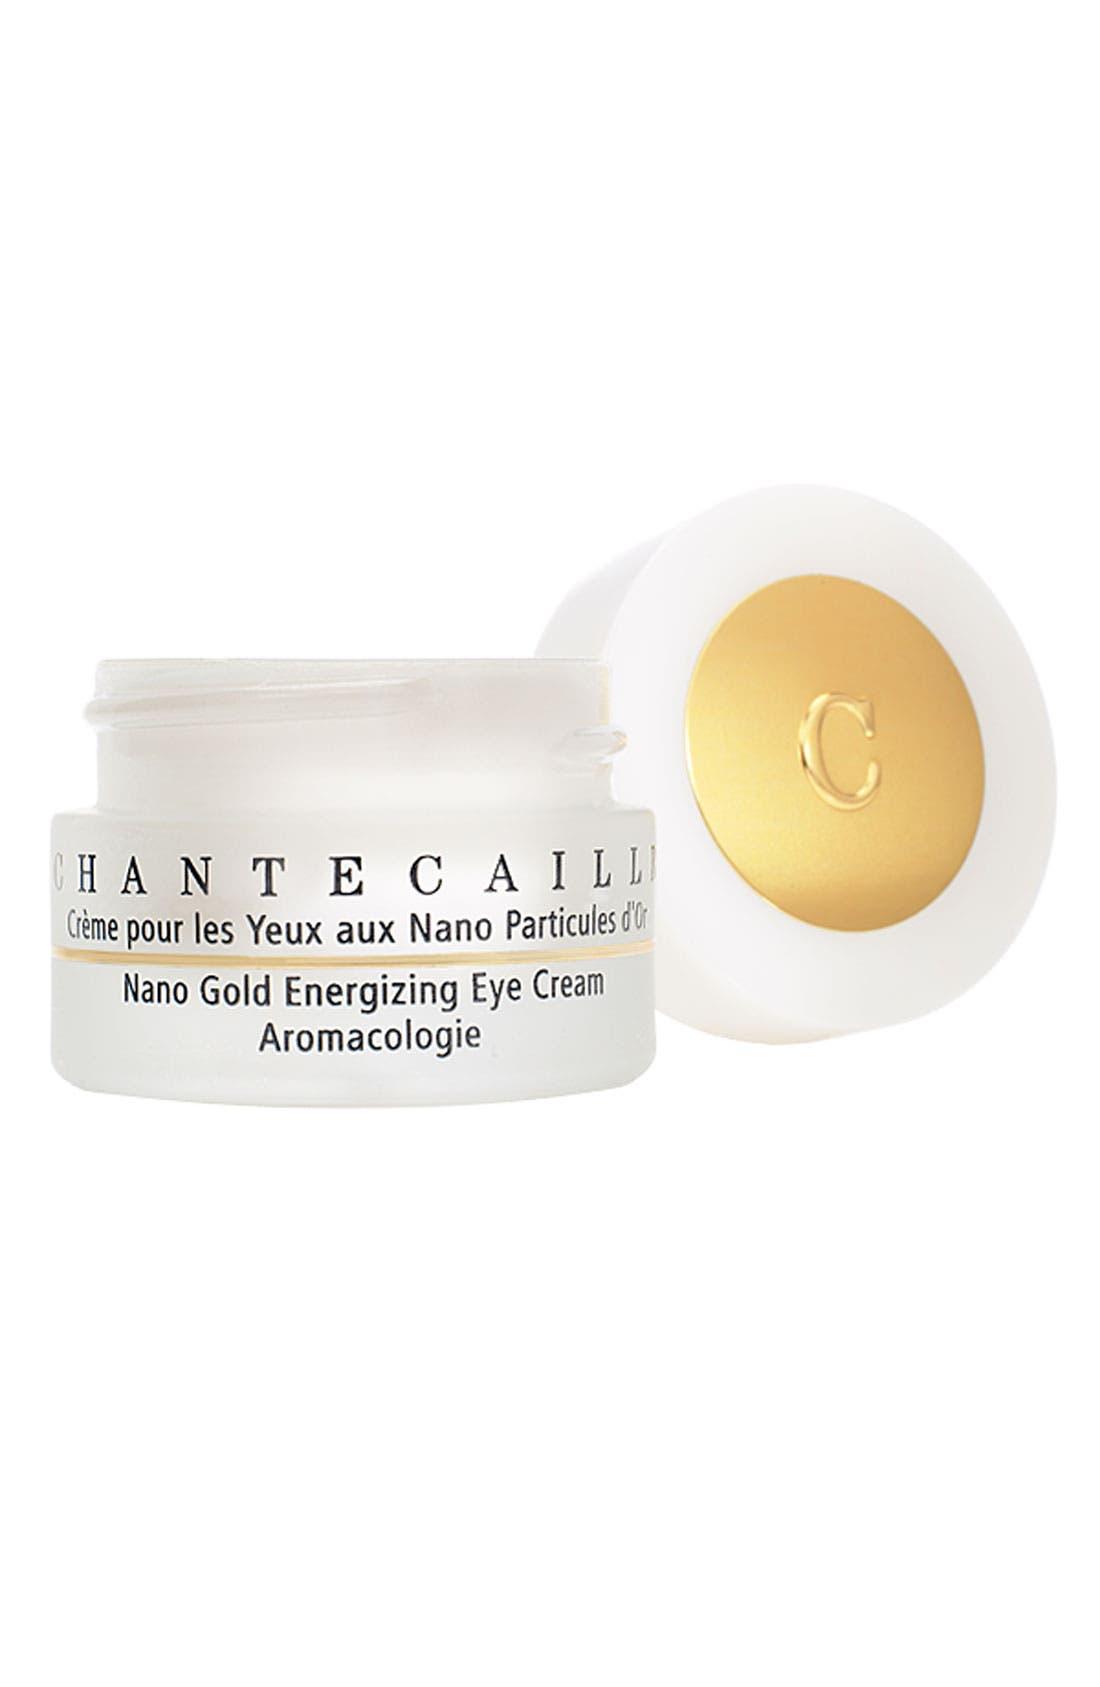 Nano Gold Energizing Eye Cream,                             Main thumbnail 1, color,                             NO COLOR